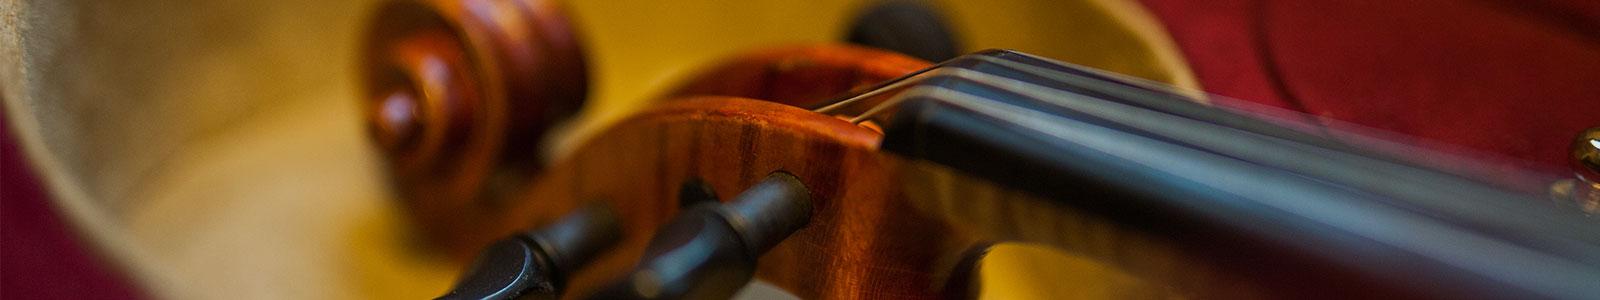 Musikkonservatoriet Falun - Folkmusik